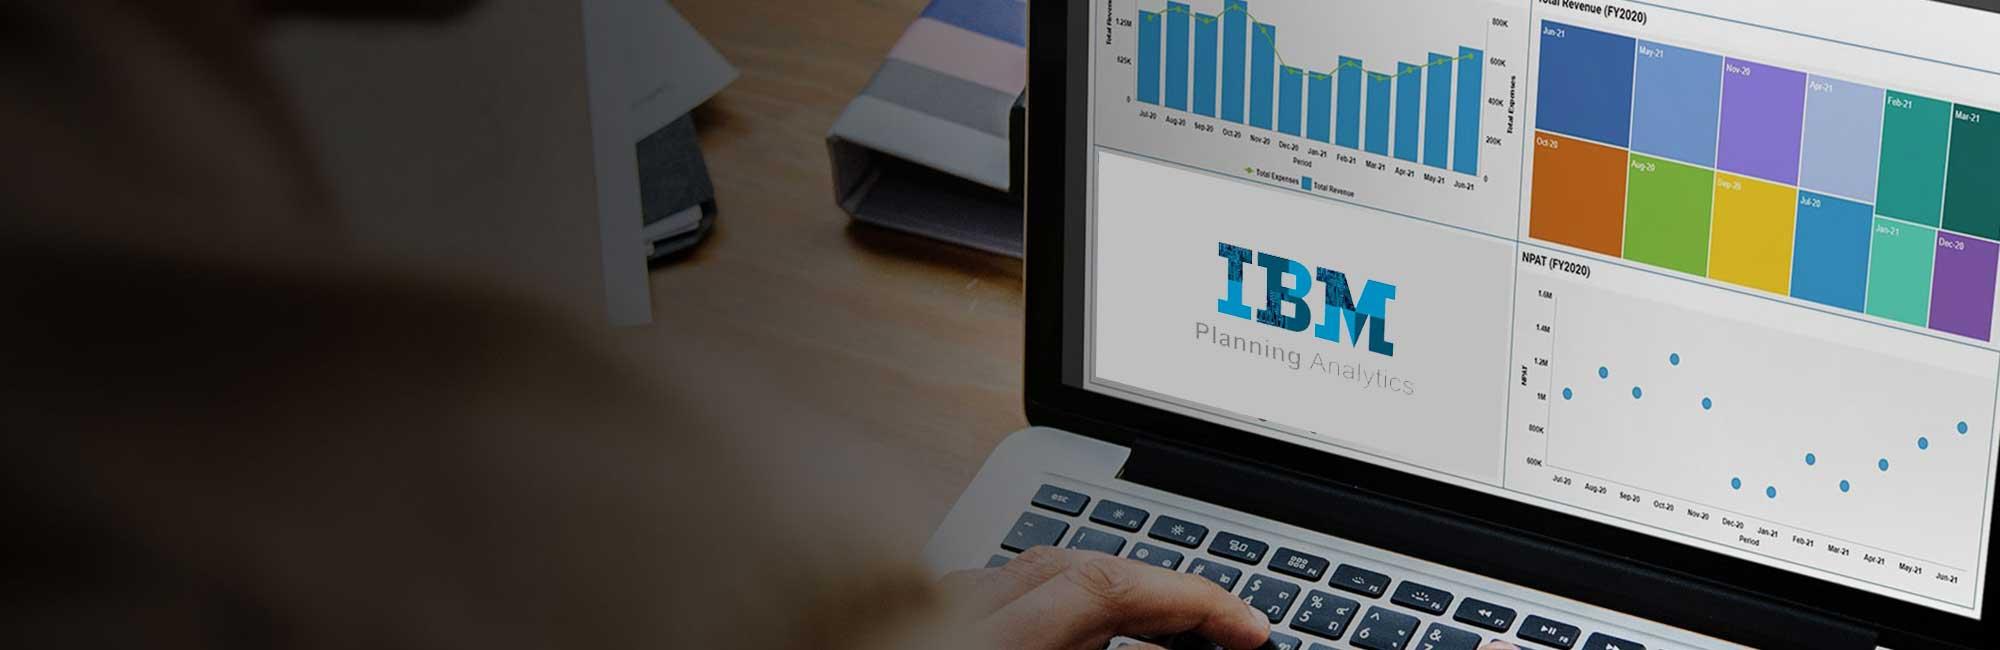 Lastest release of IBM Planning Analytics